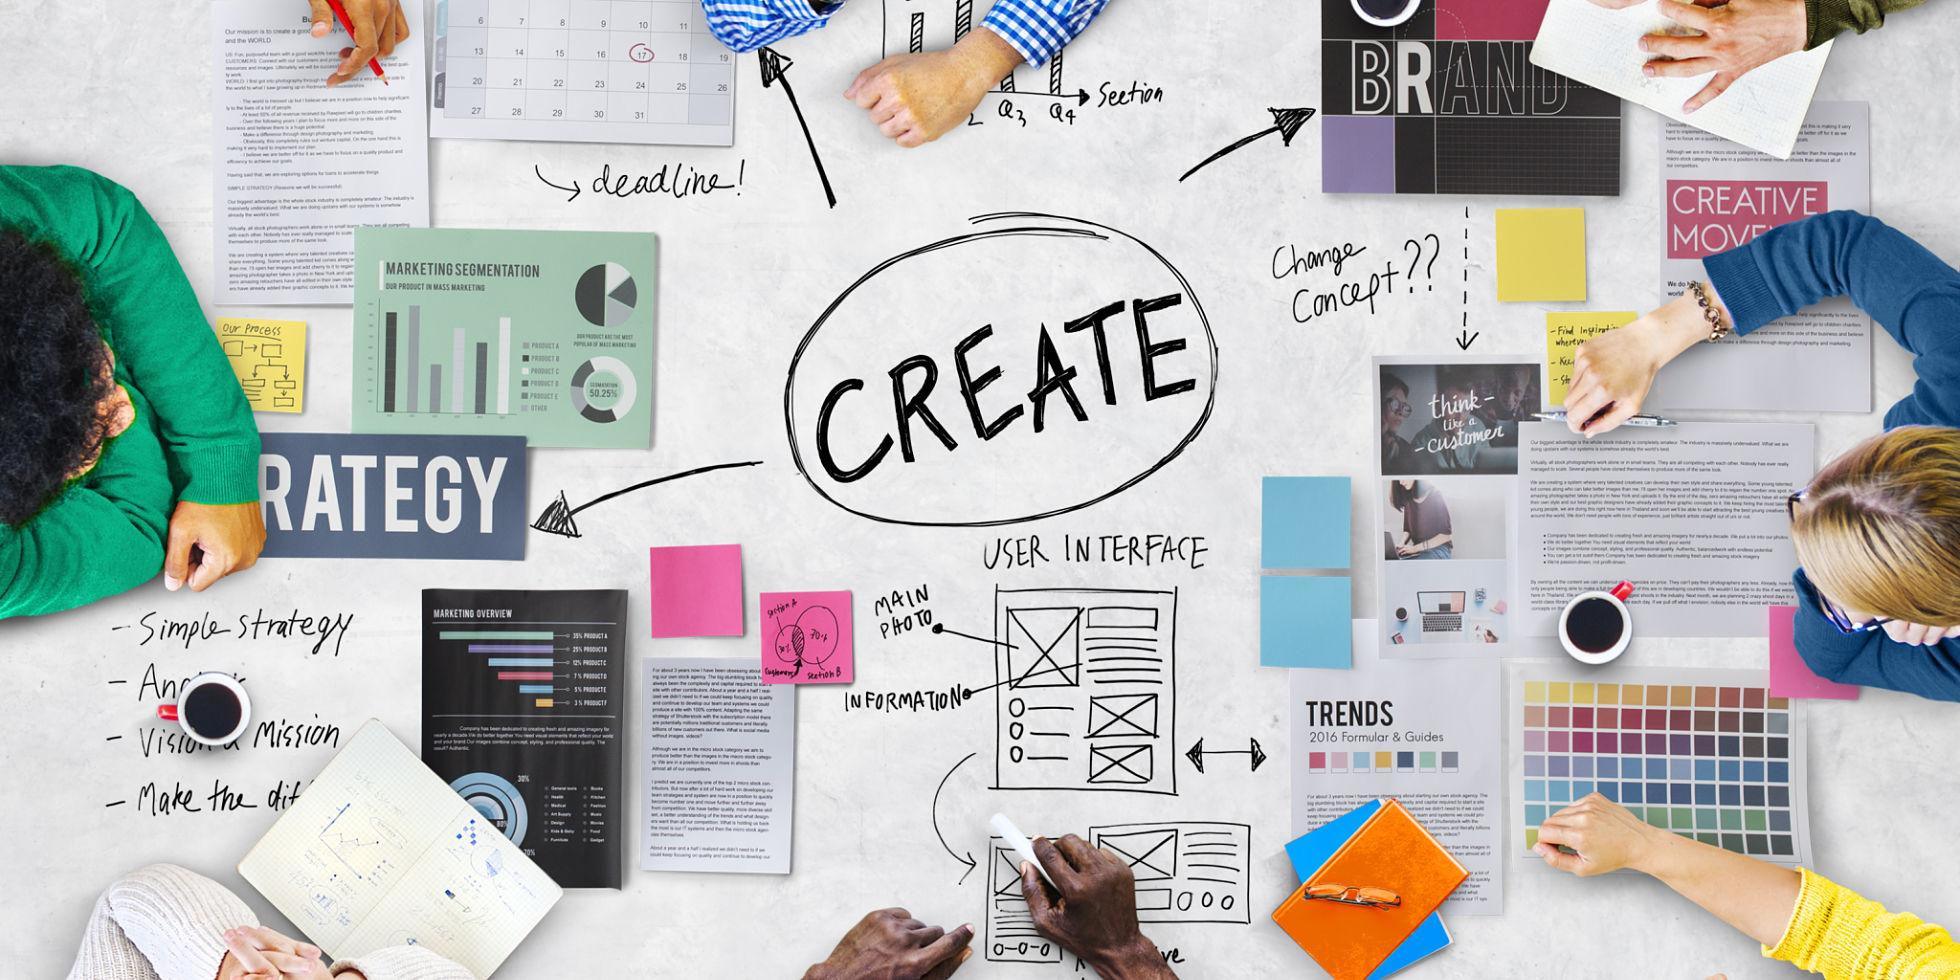 strategy, branding, brands, creative agency, design agency